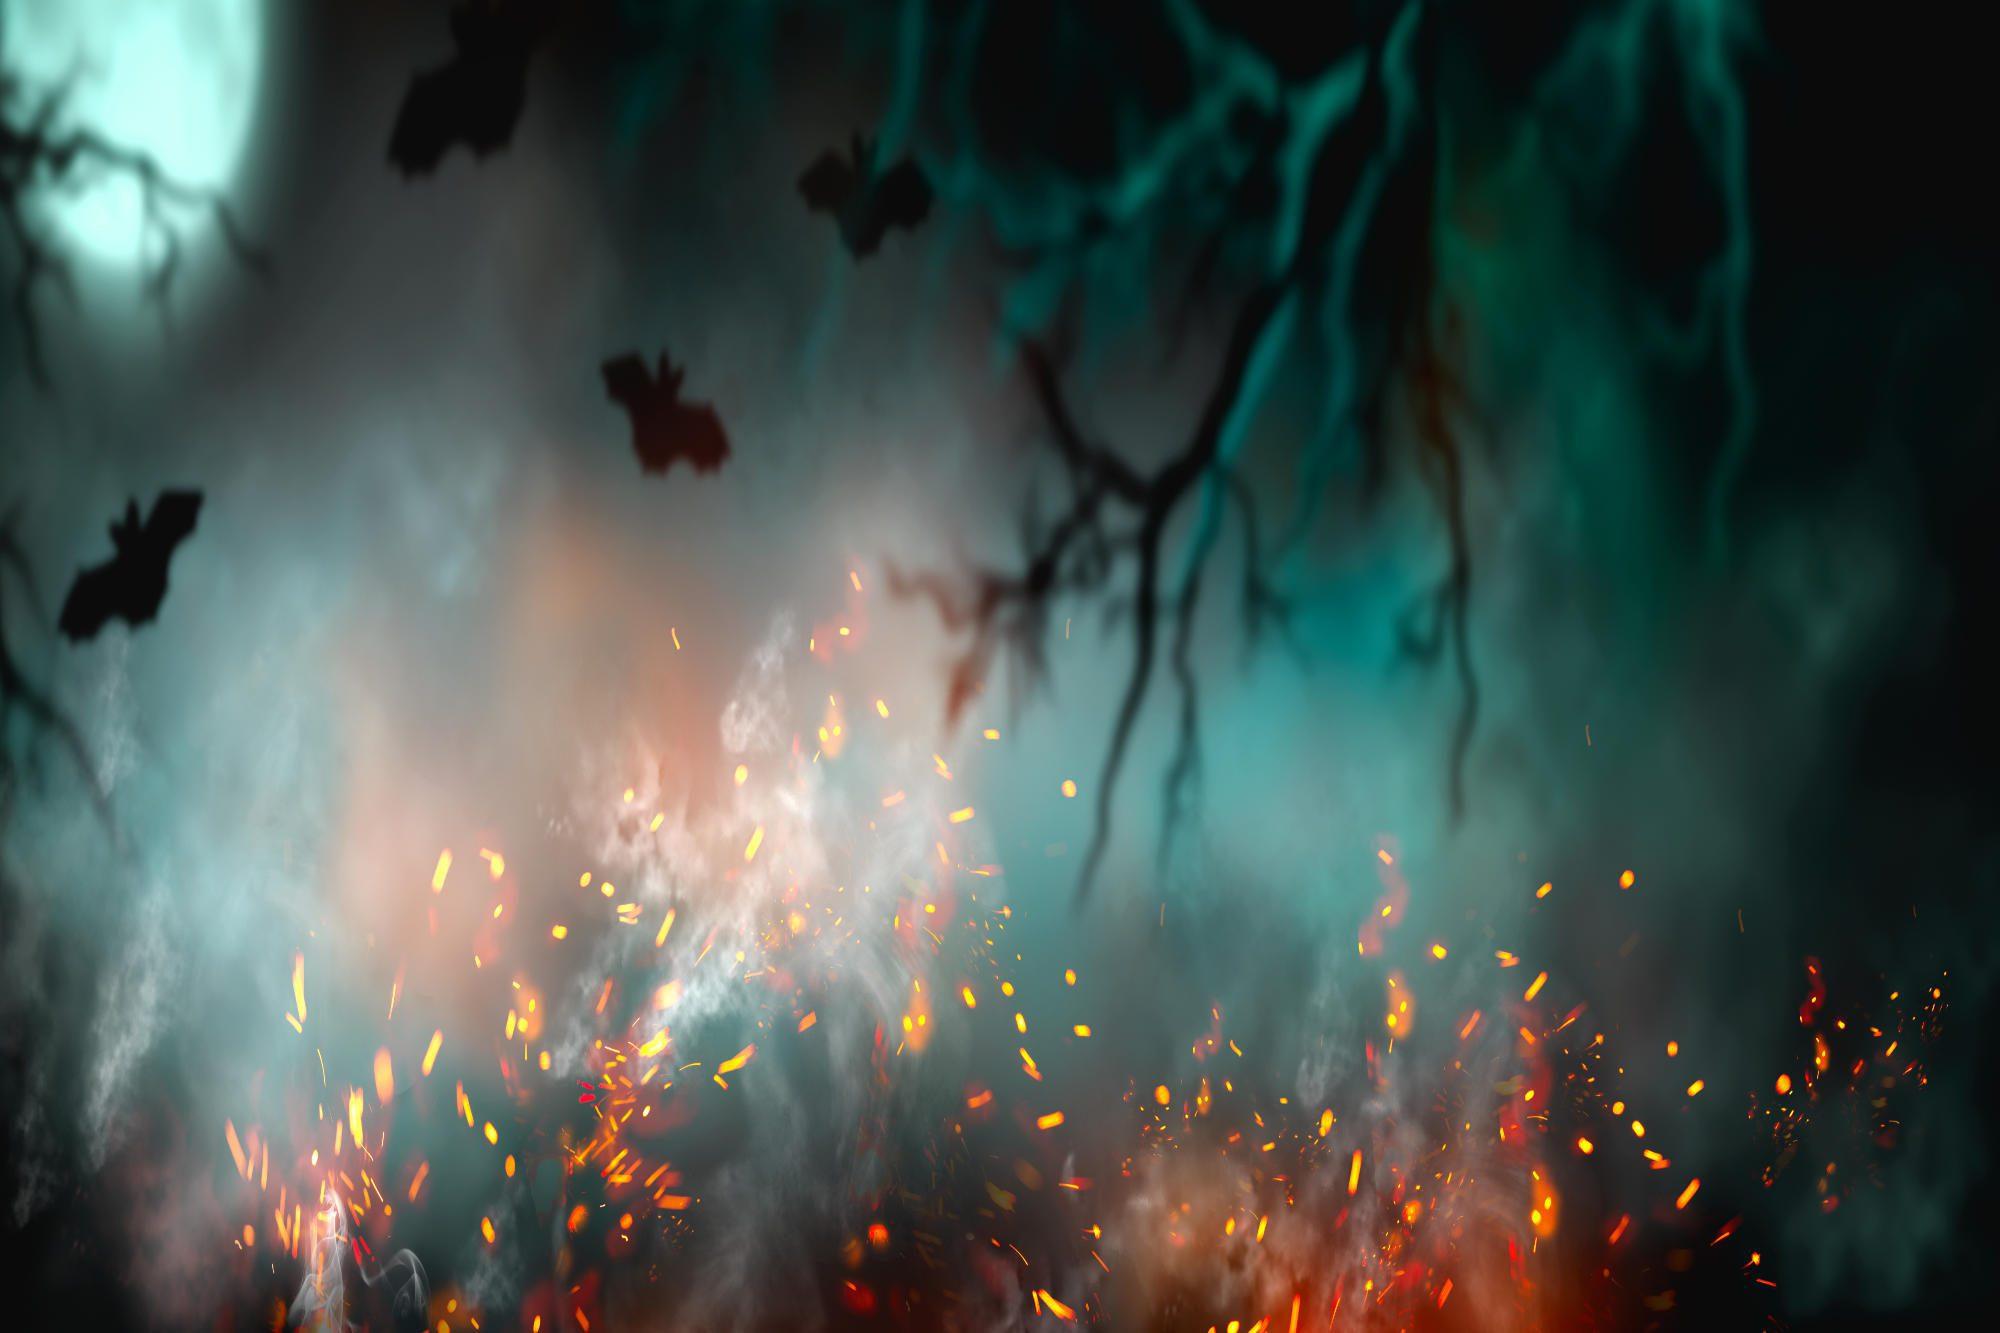 Dark deep forest backdrop with smoke, fire, vampire bats.